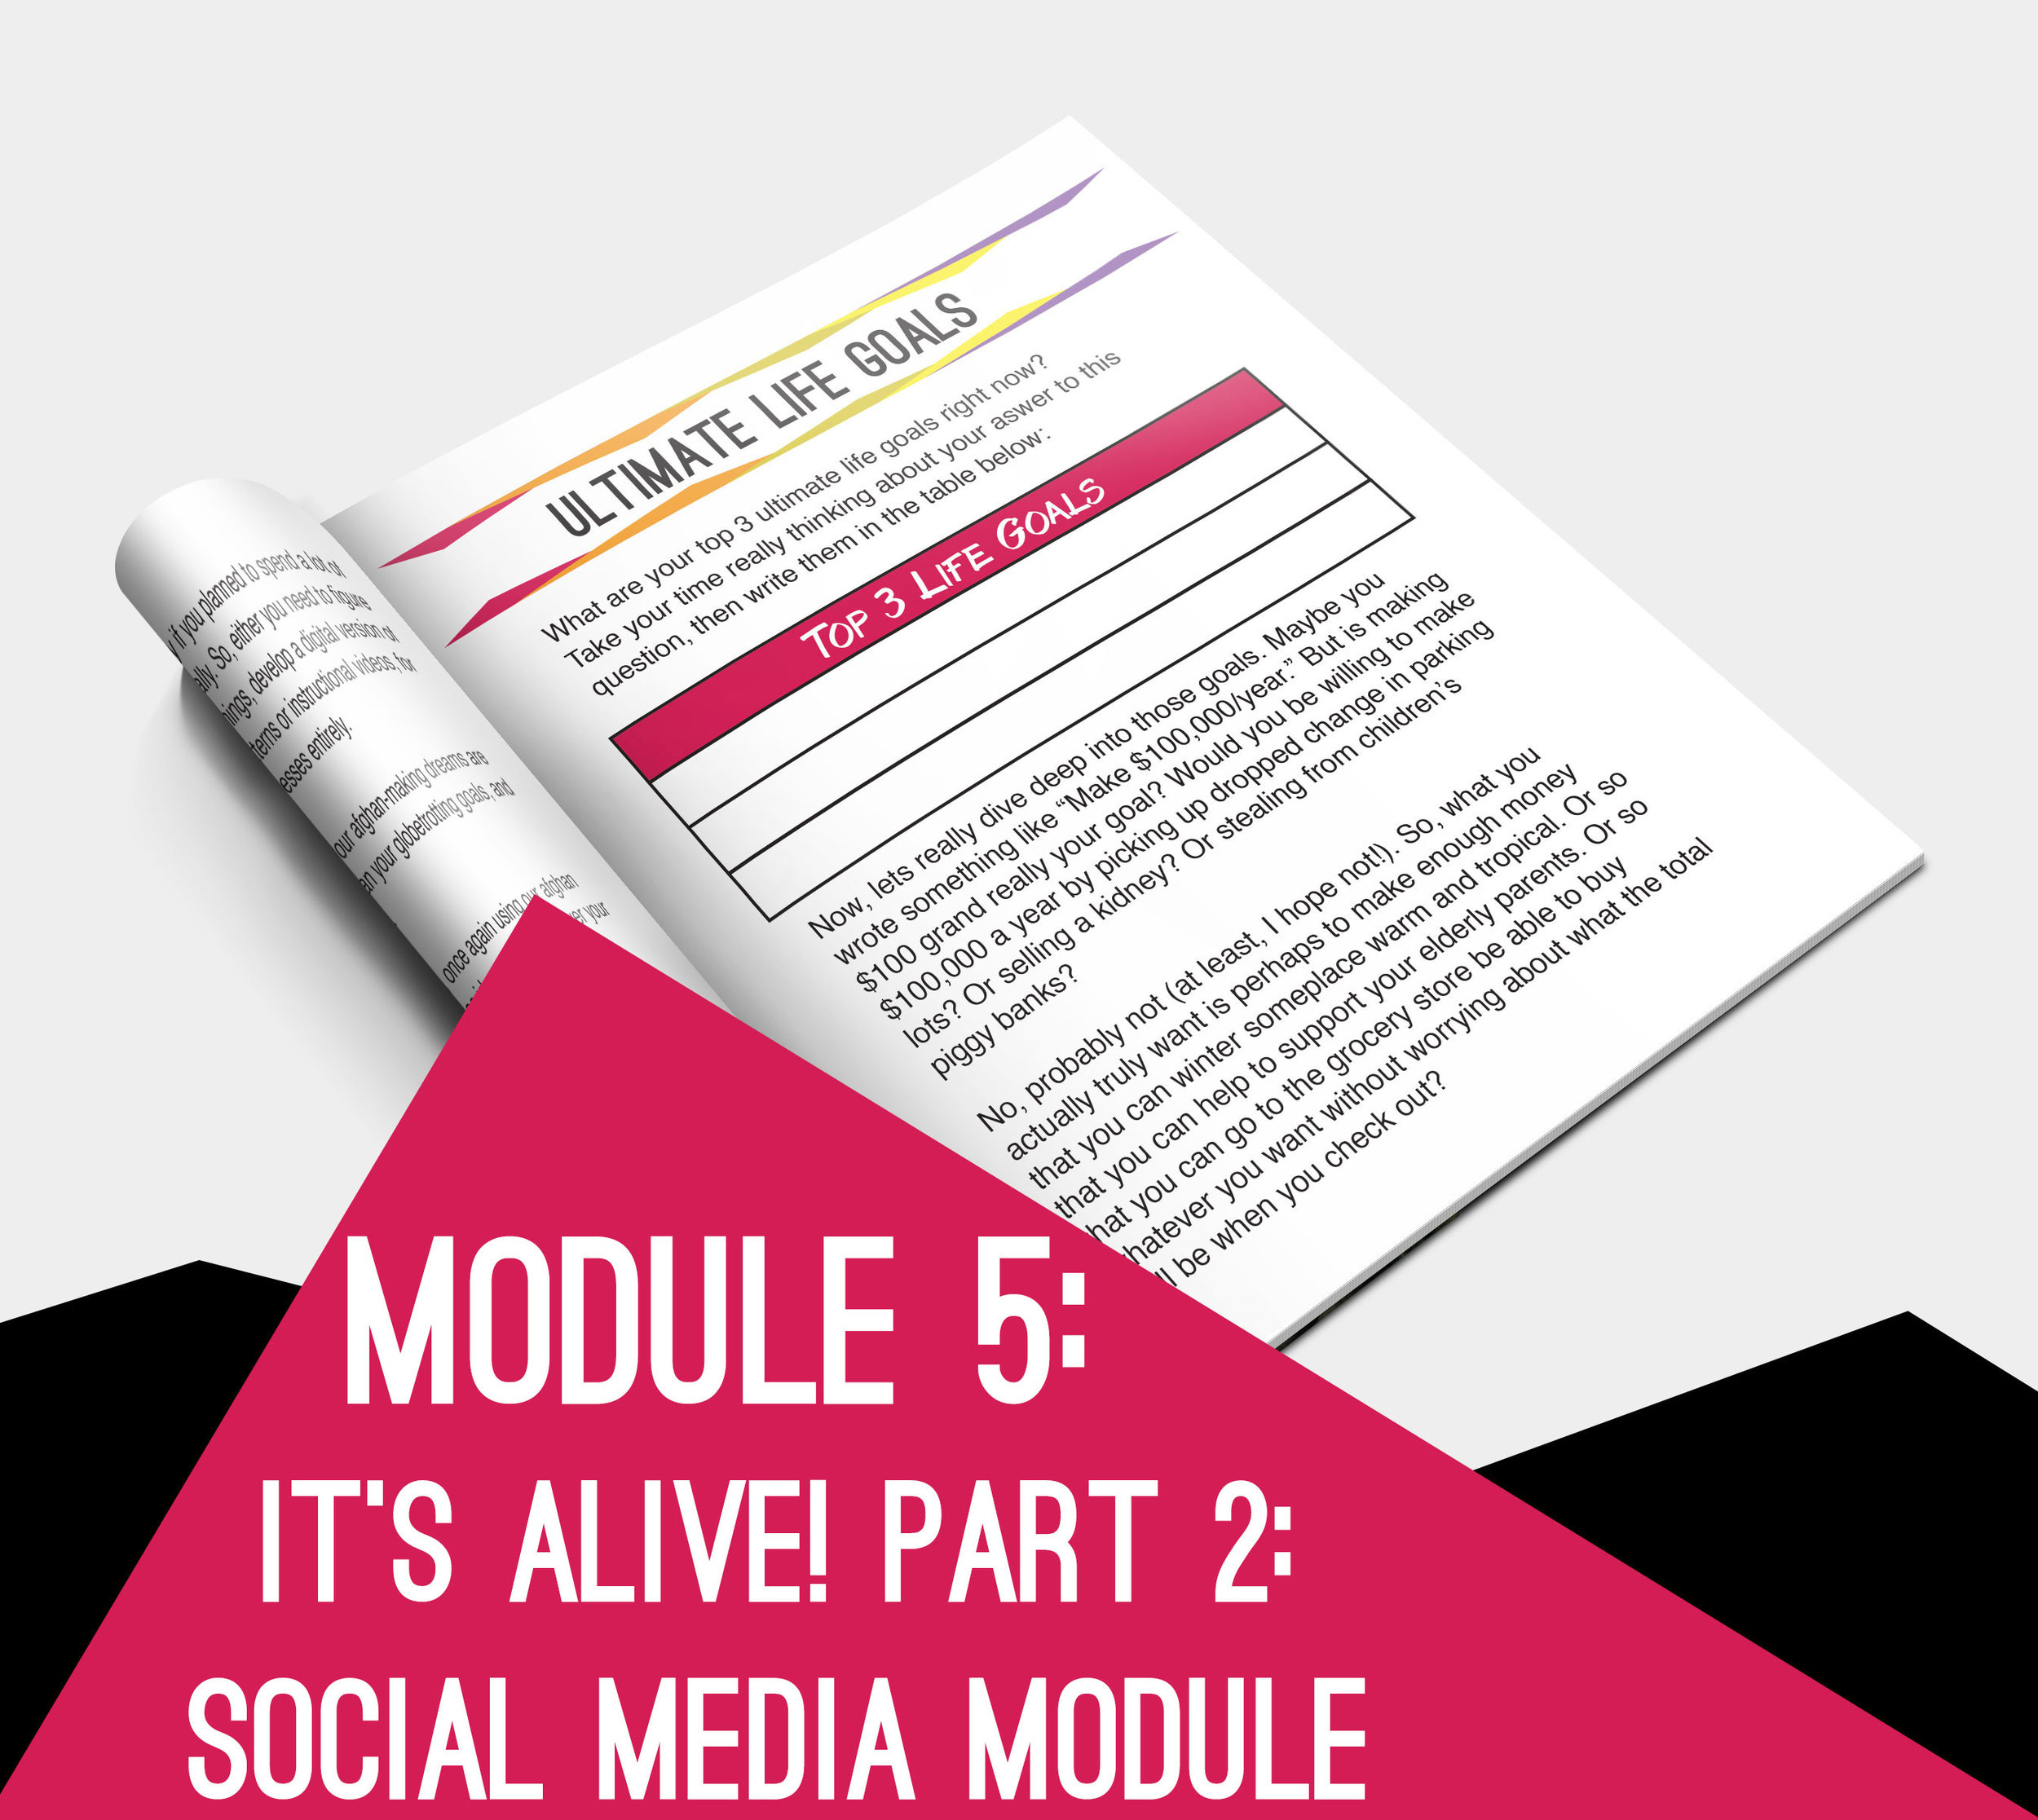 Business-Incubator-Mod-5-social-media.jpg